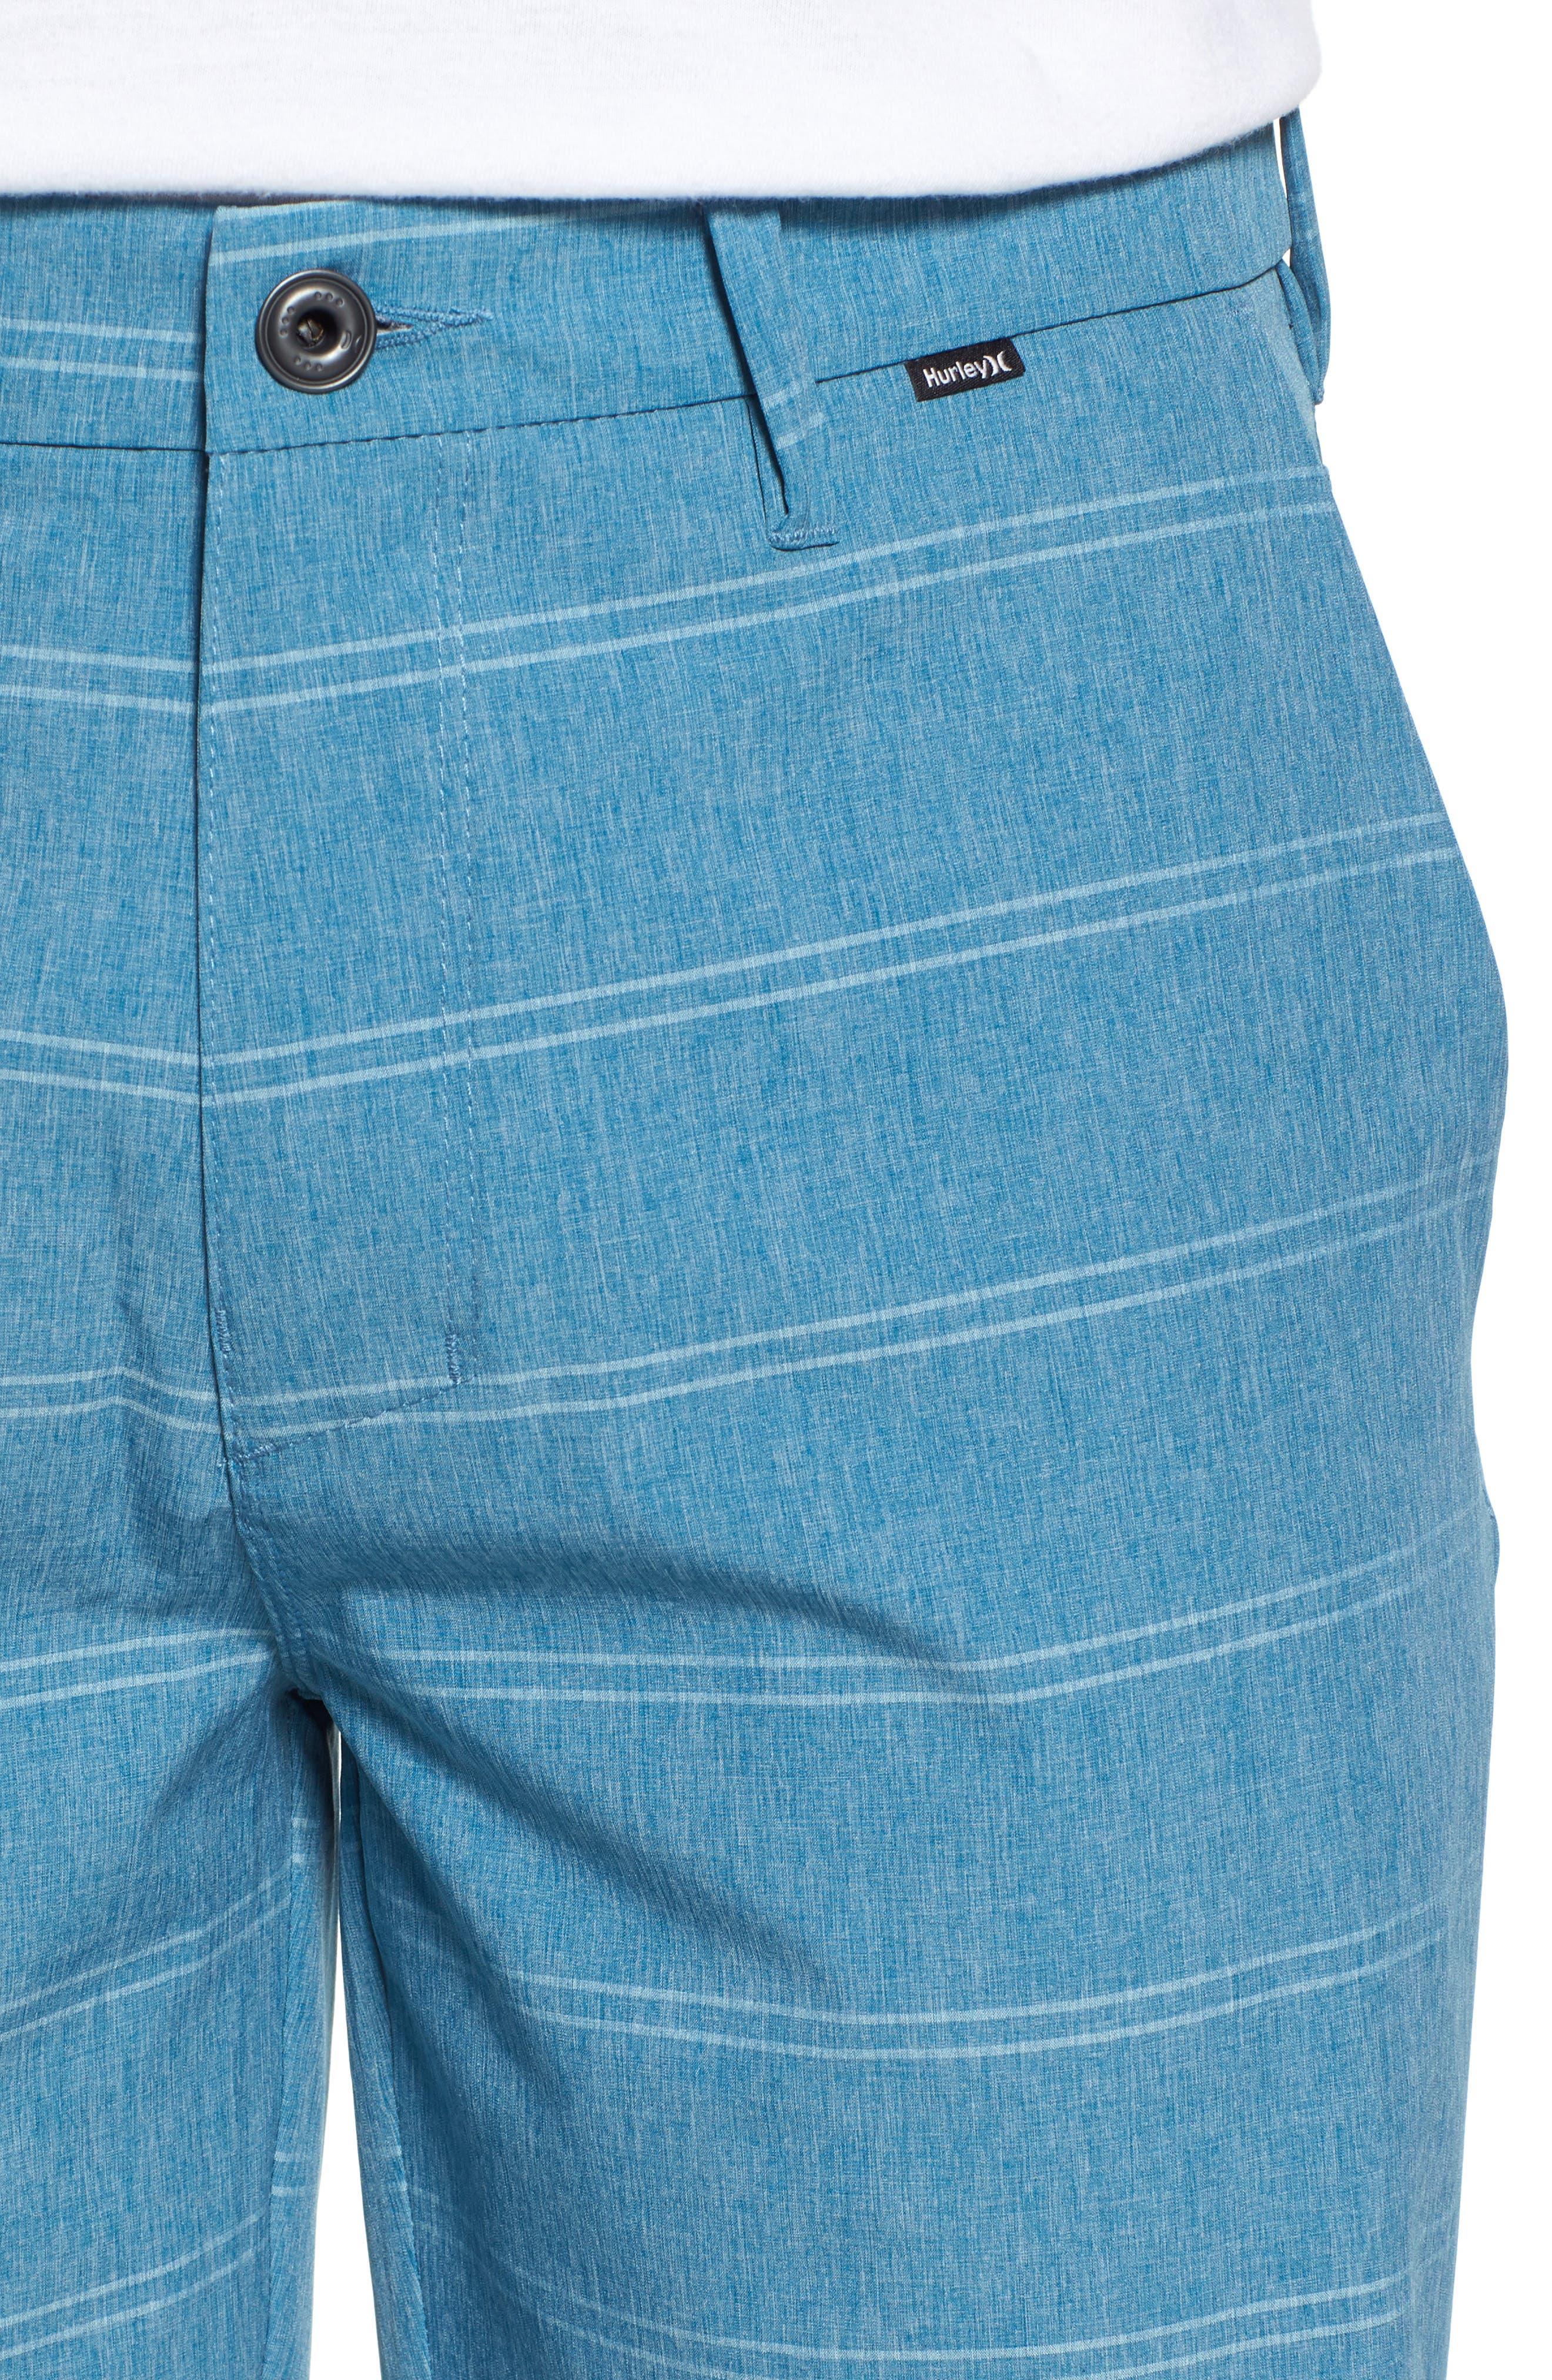 Phantom Hybrid Shorts,                             Alternate thumbnail 5, color,                             Space Blue